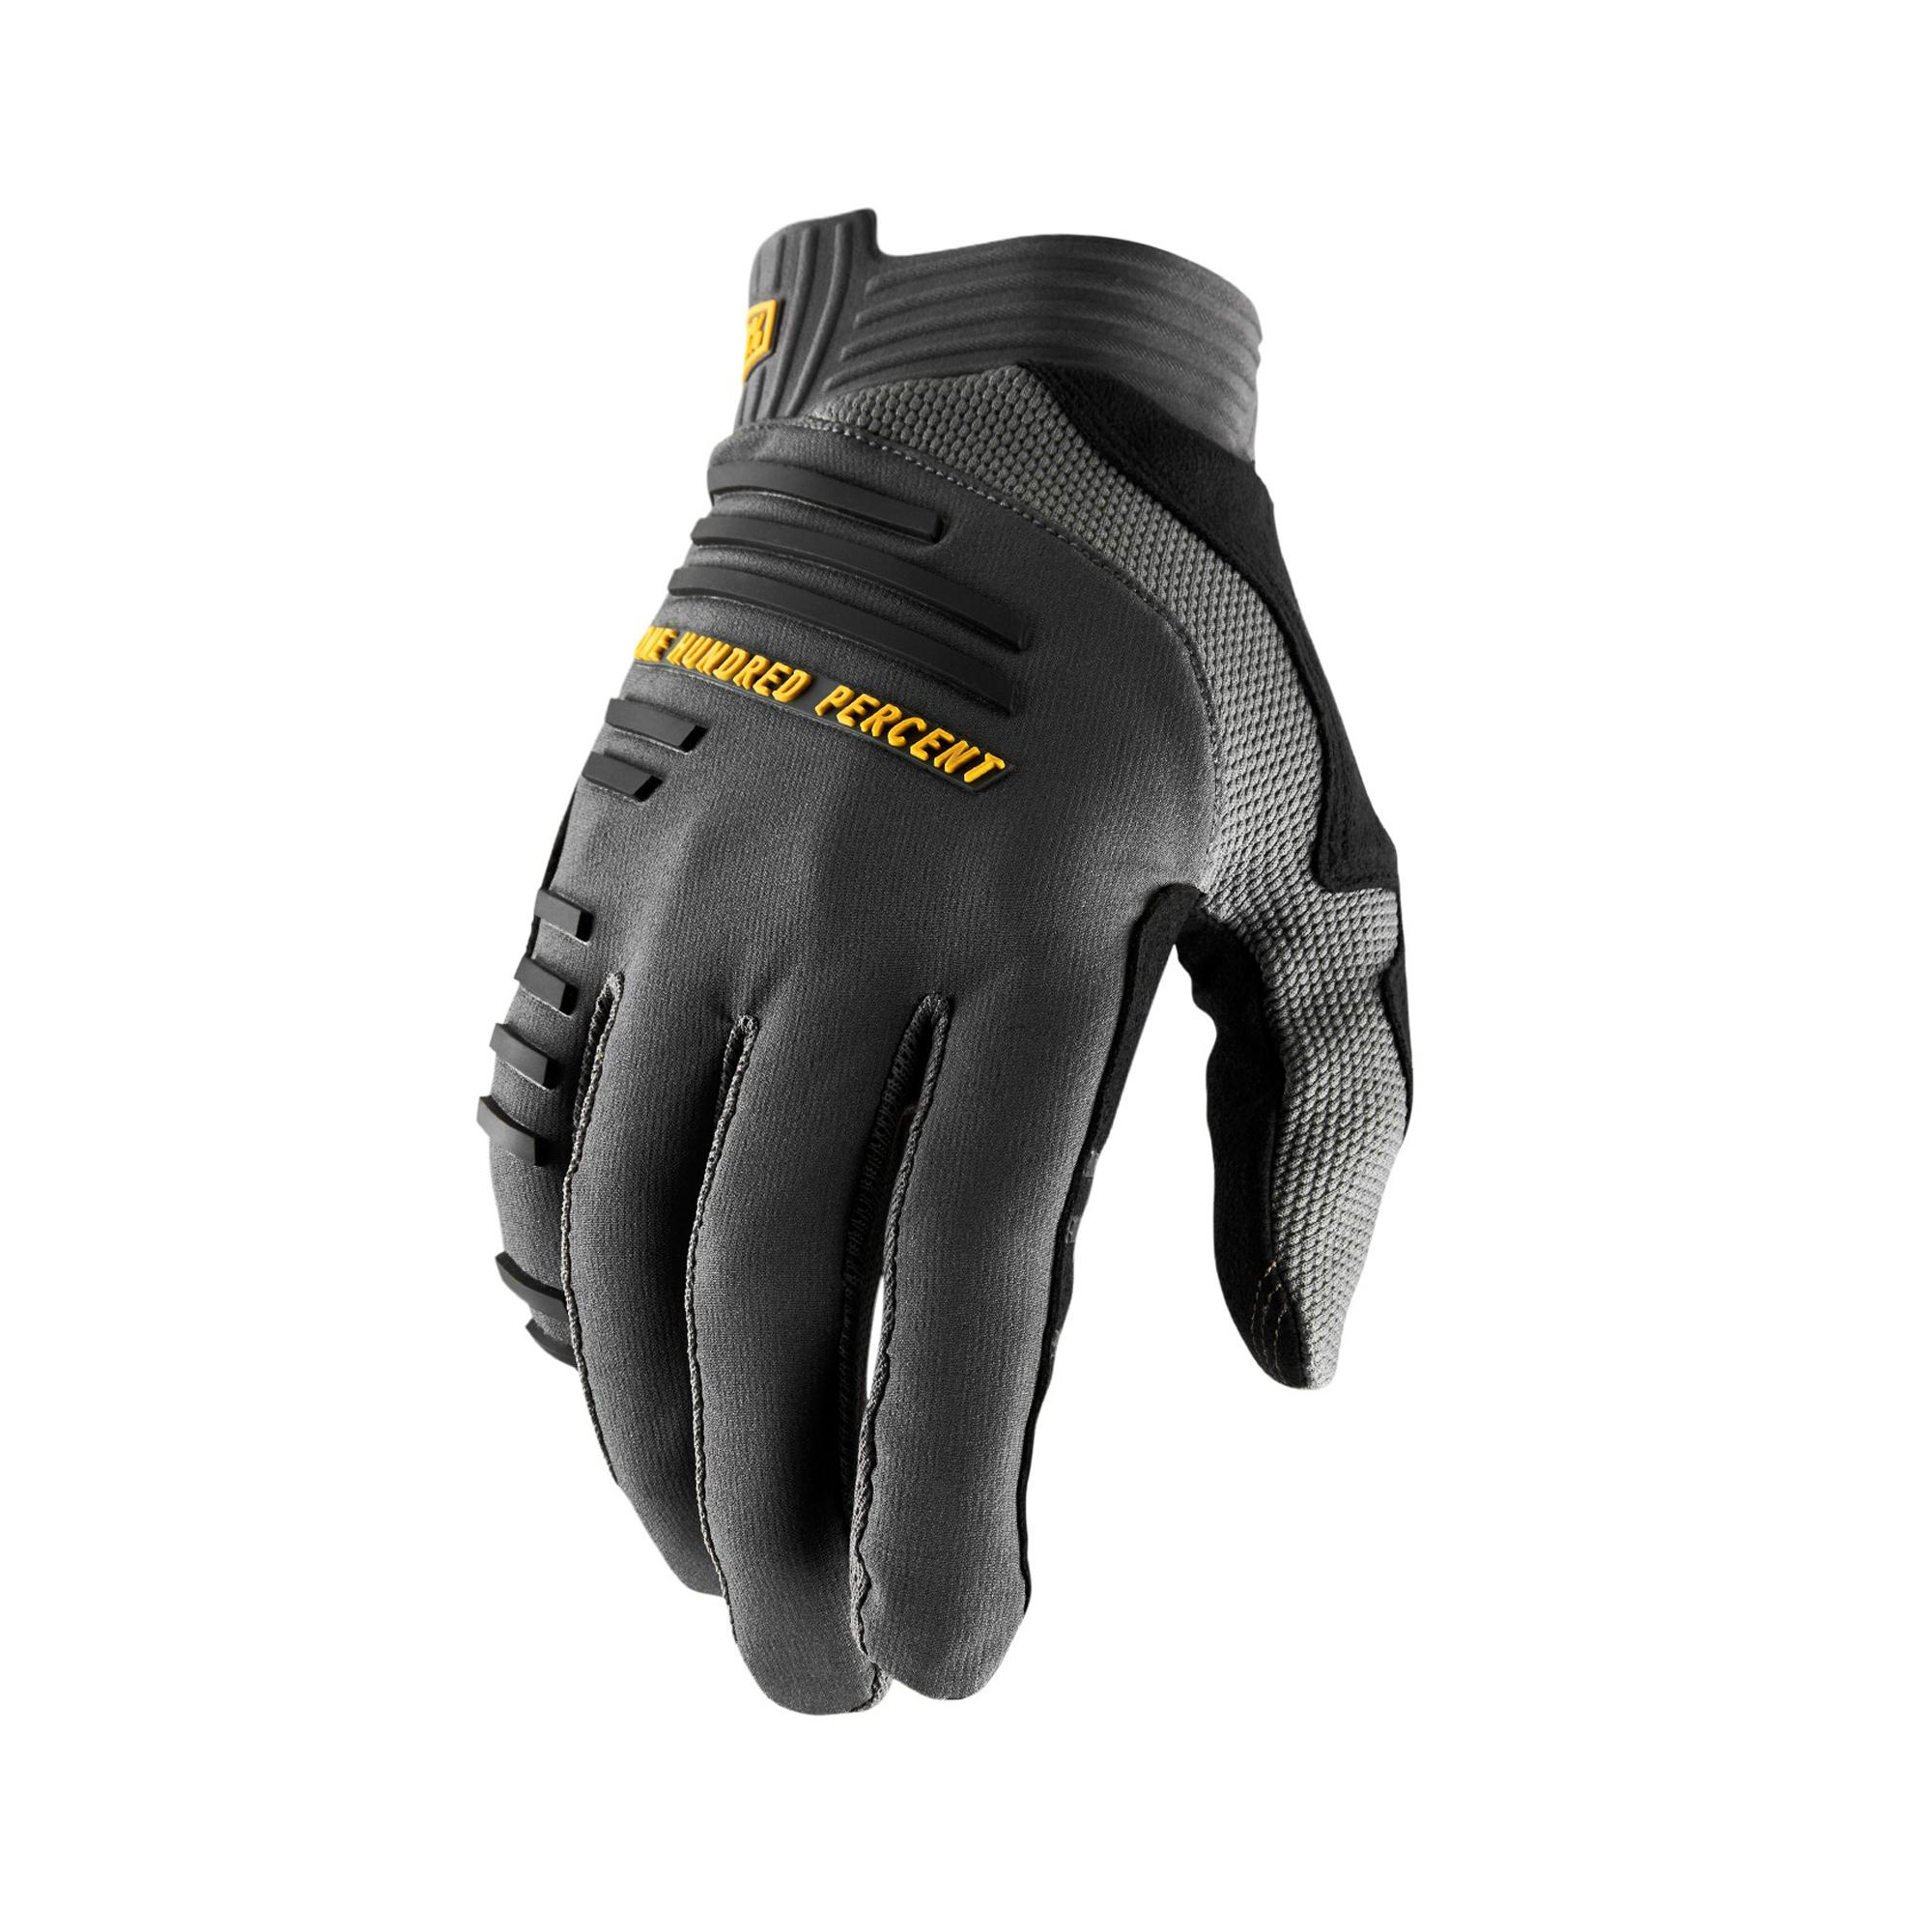 R-CORE Glove Charcoal -